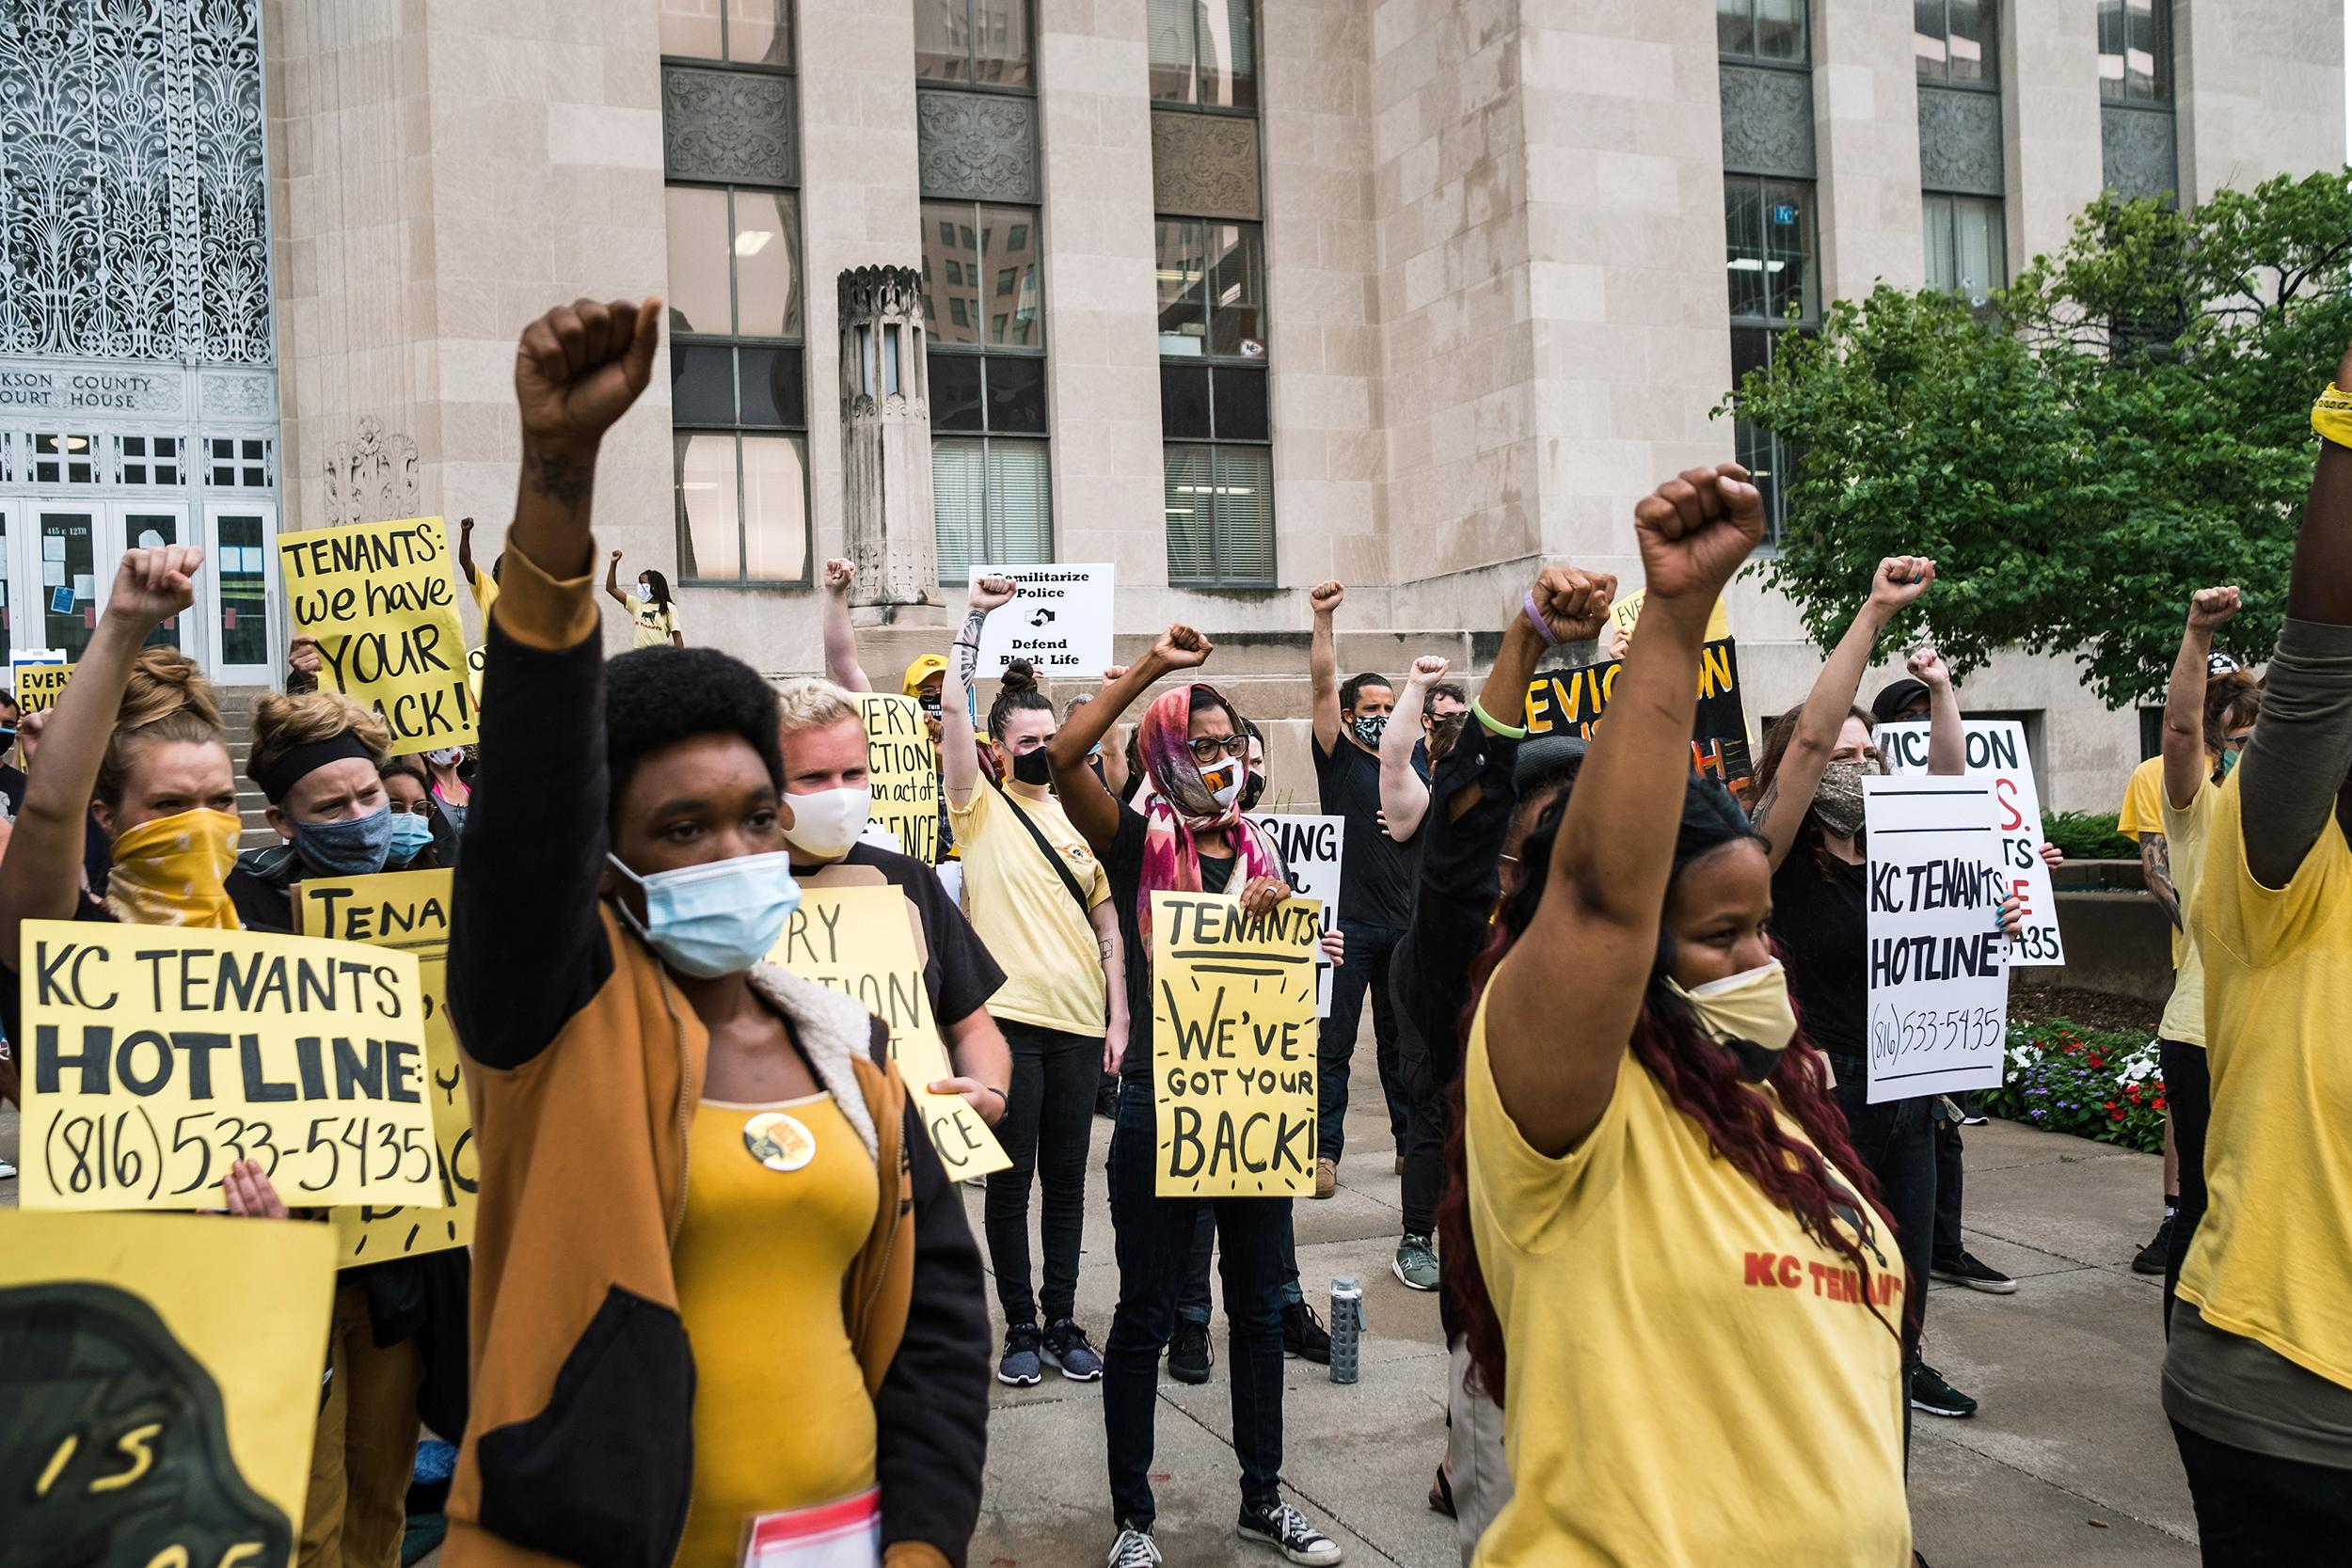 Activists attempt to disrupt Kansas City eviction court after coronavirus moratorium lifted